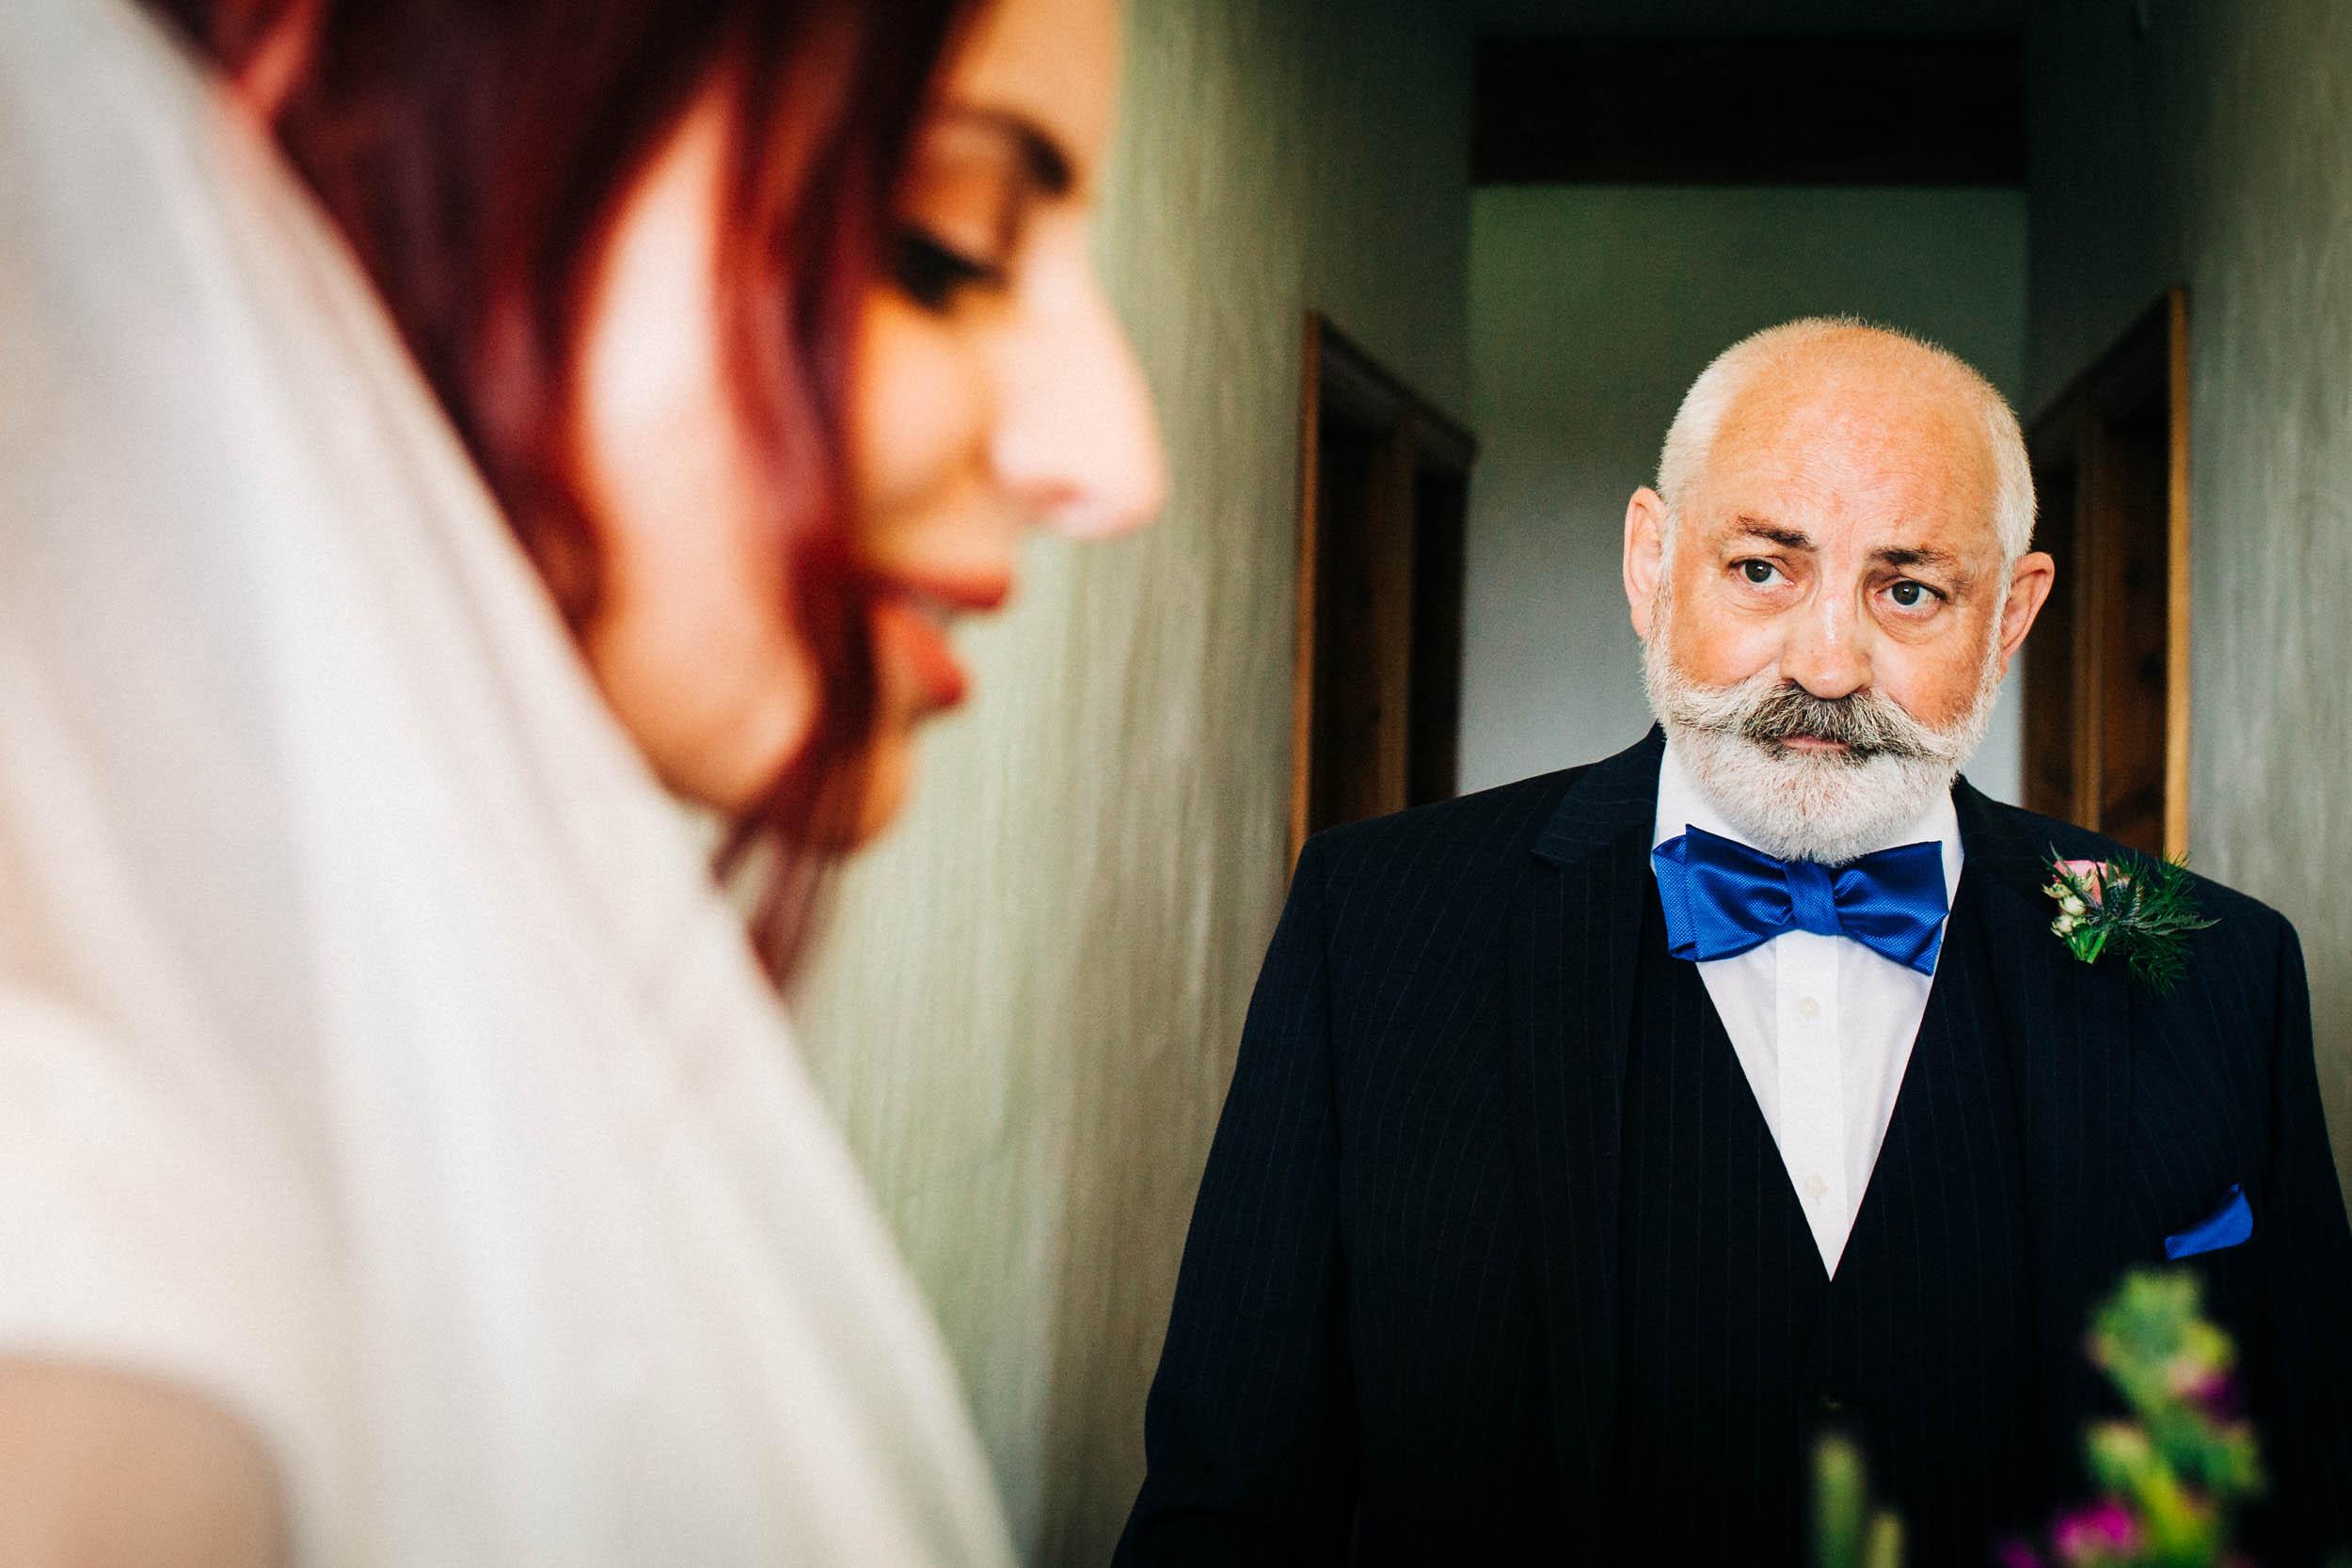 Alex_Sedgmond_Photography-SouthWalesWeddingPhotography-Wedding-Photographer-Cardiff-132.jpg